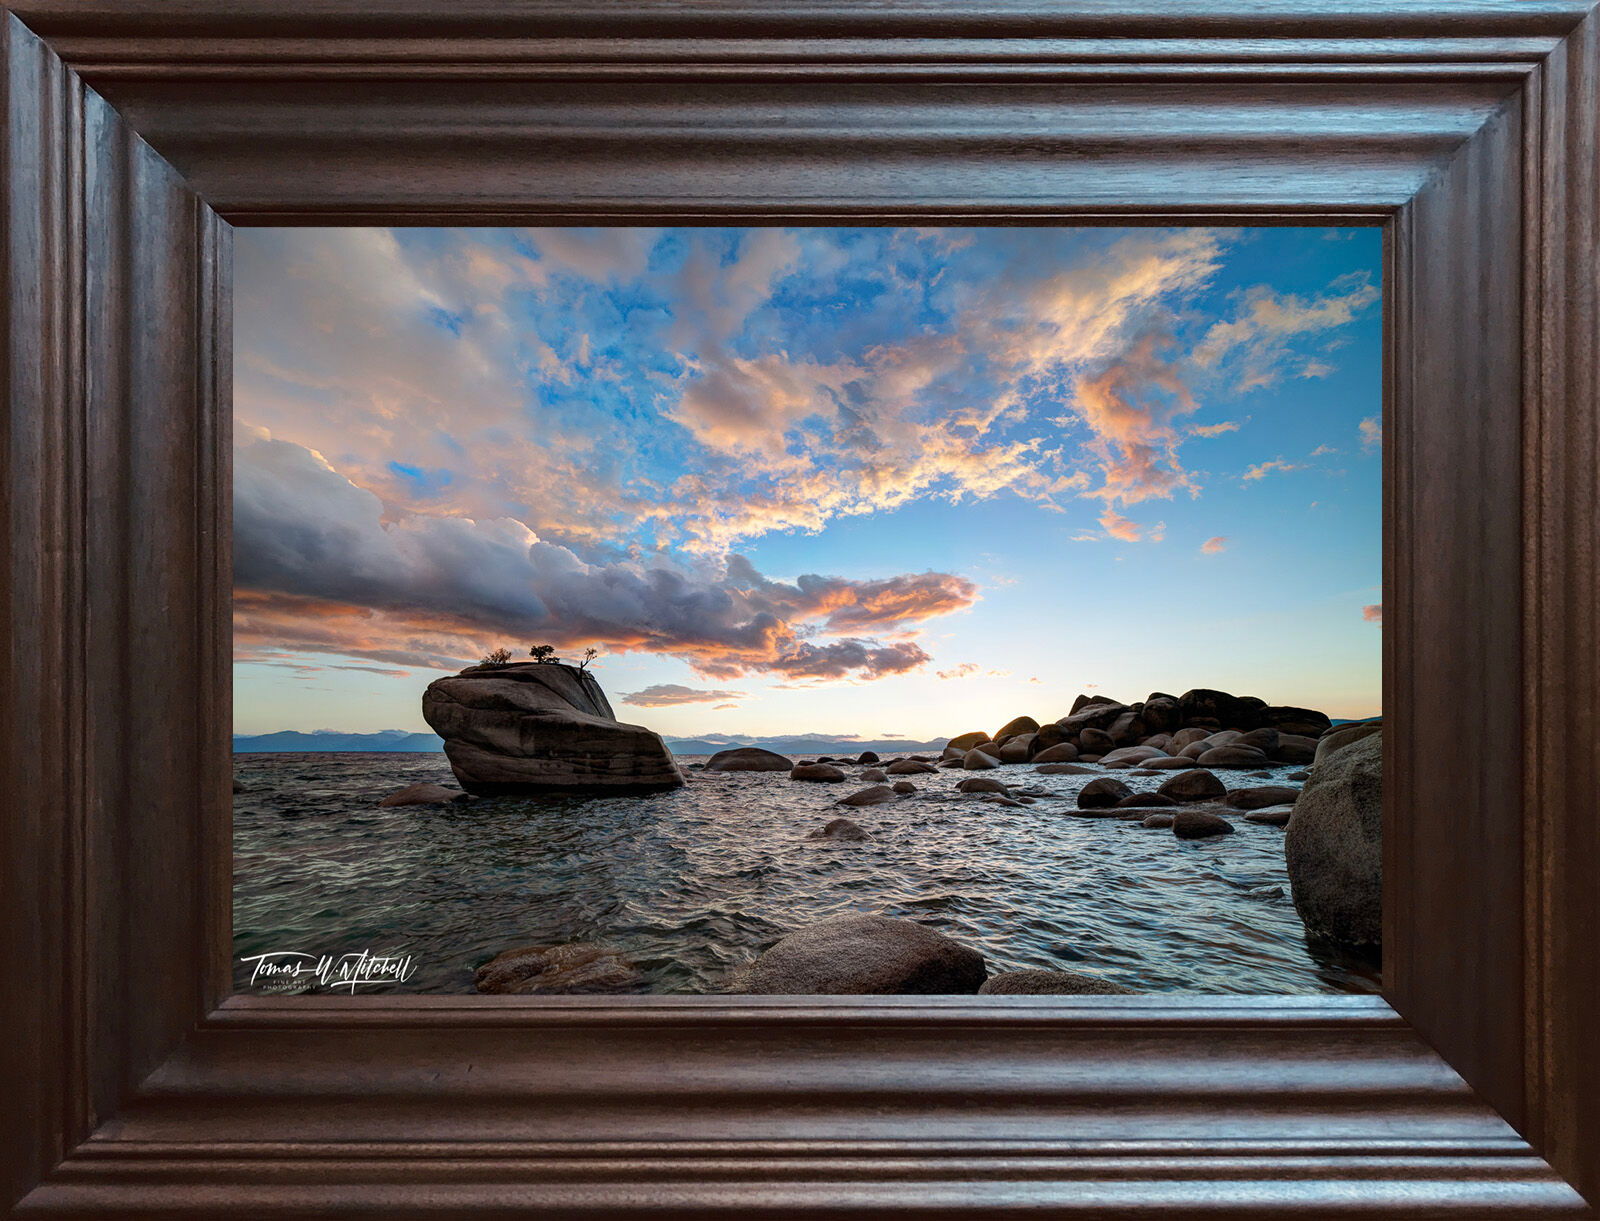 photograph, 20x30, open edition, paper print, frame, hardwood,, photo